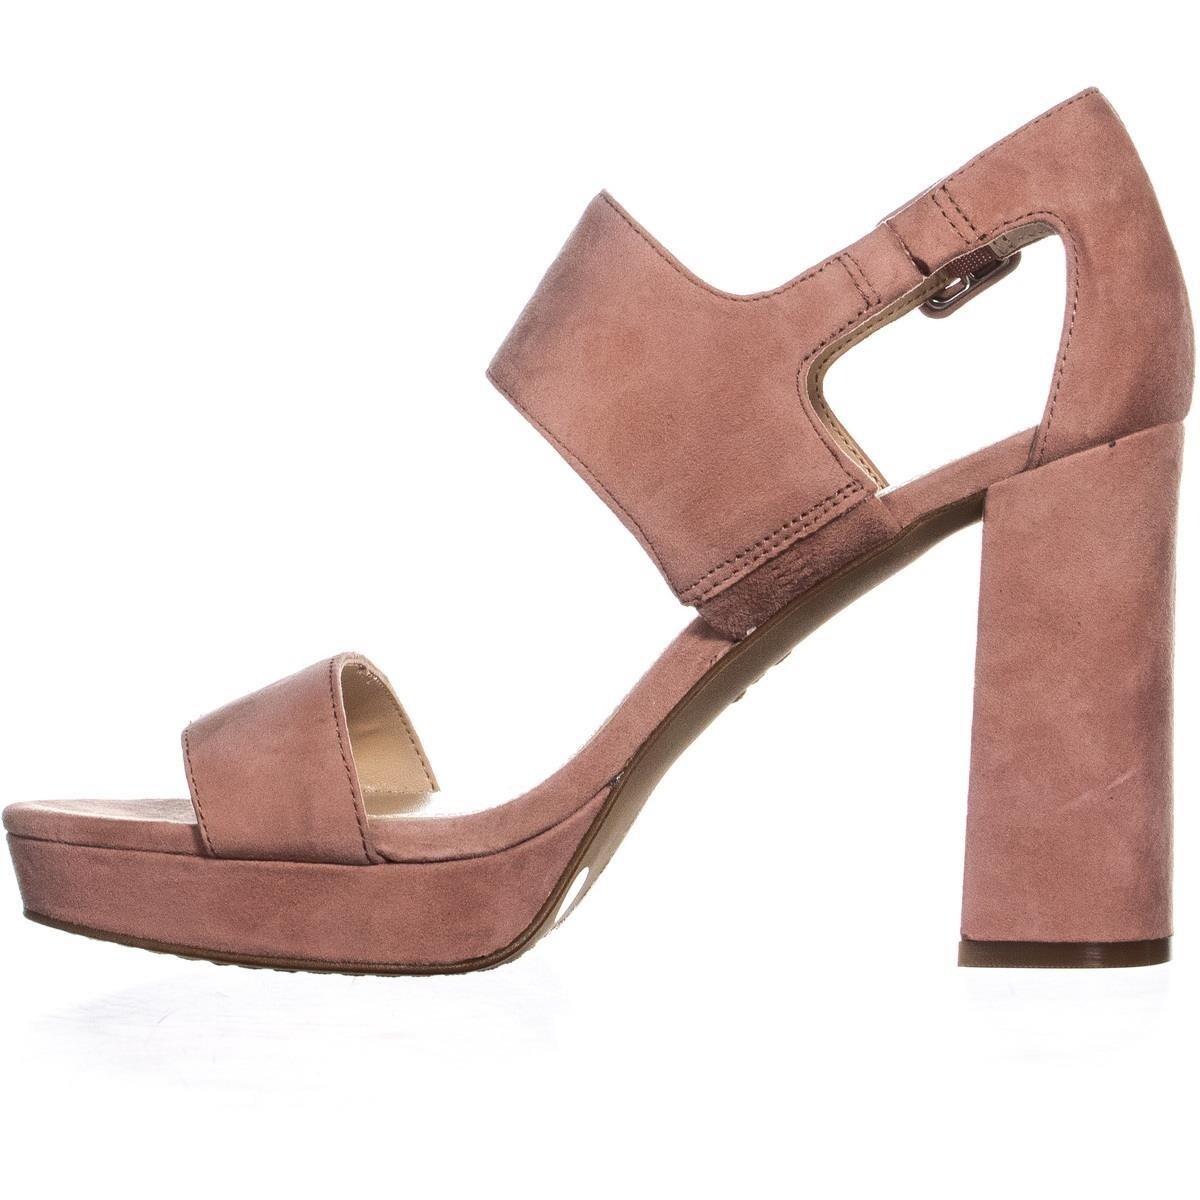 c59ae0cda4c0 Shop Vince Camuto Jayvid Block Heel Sandals